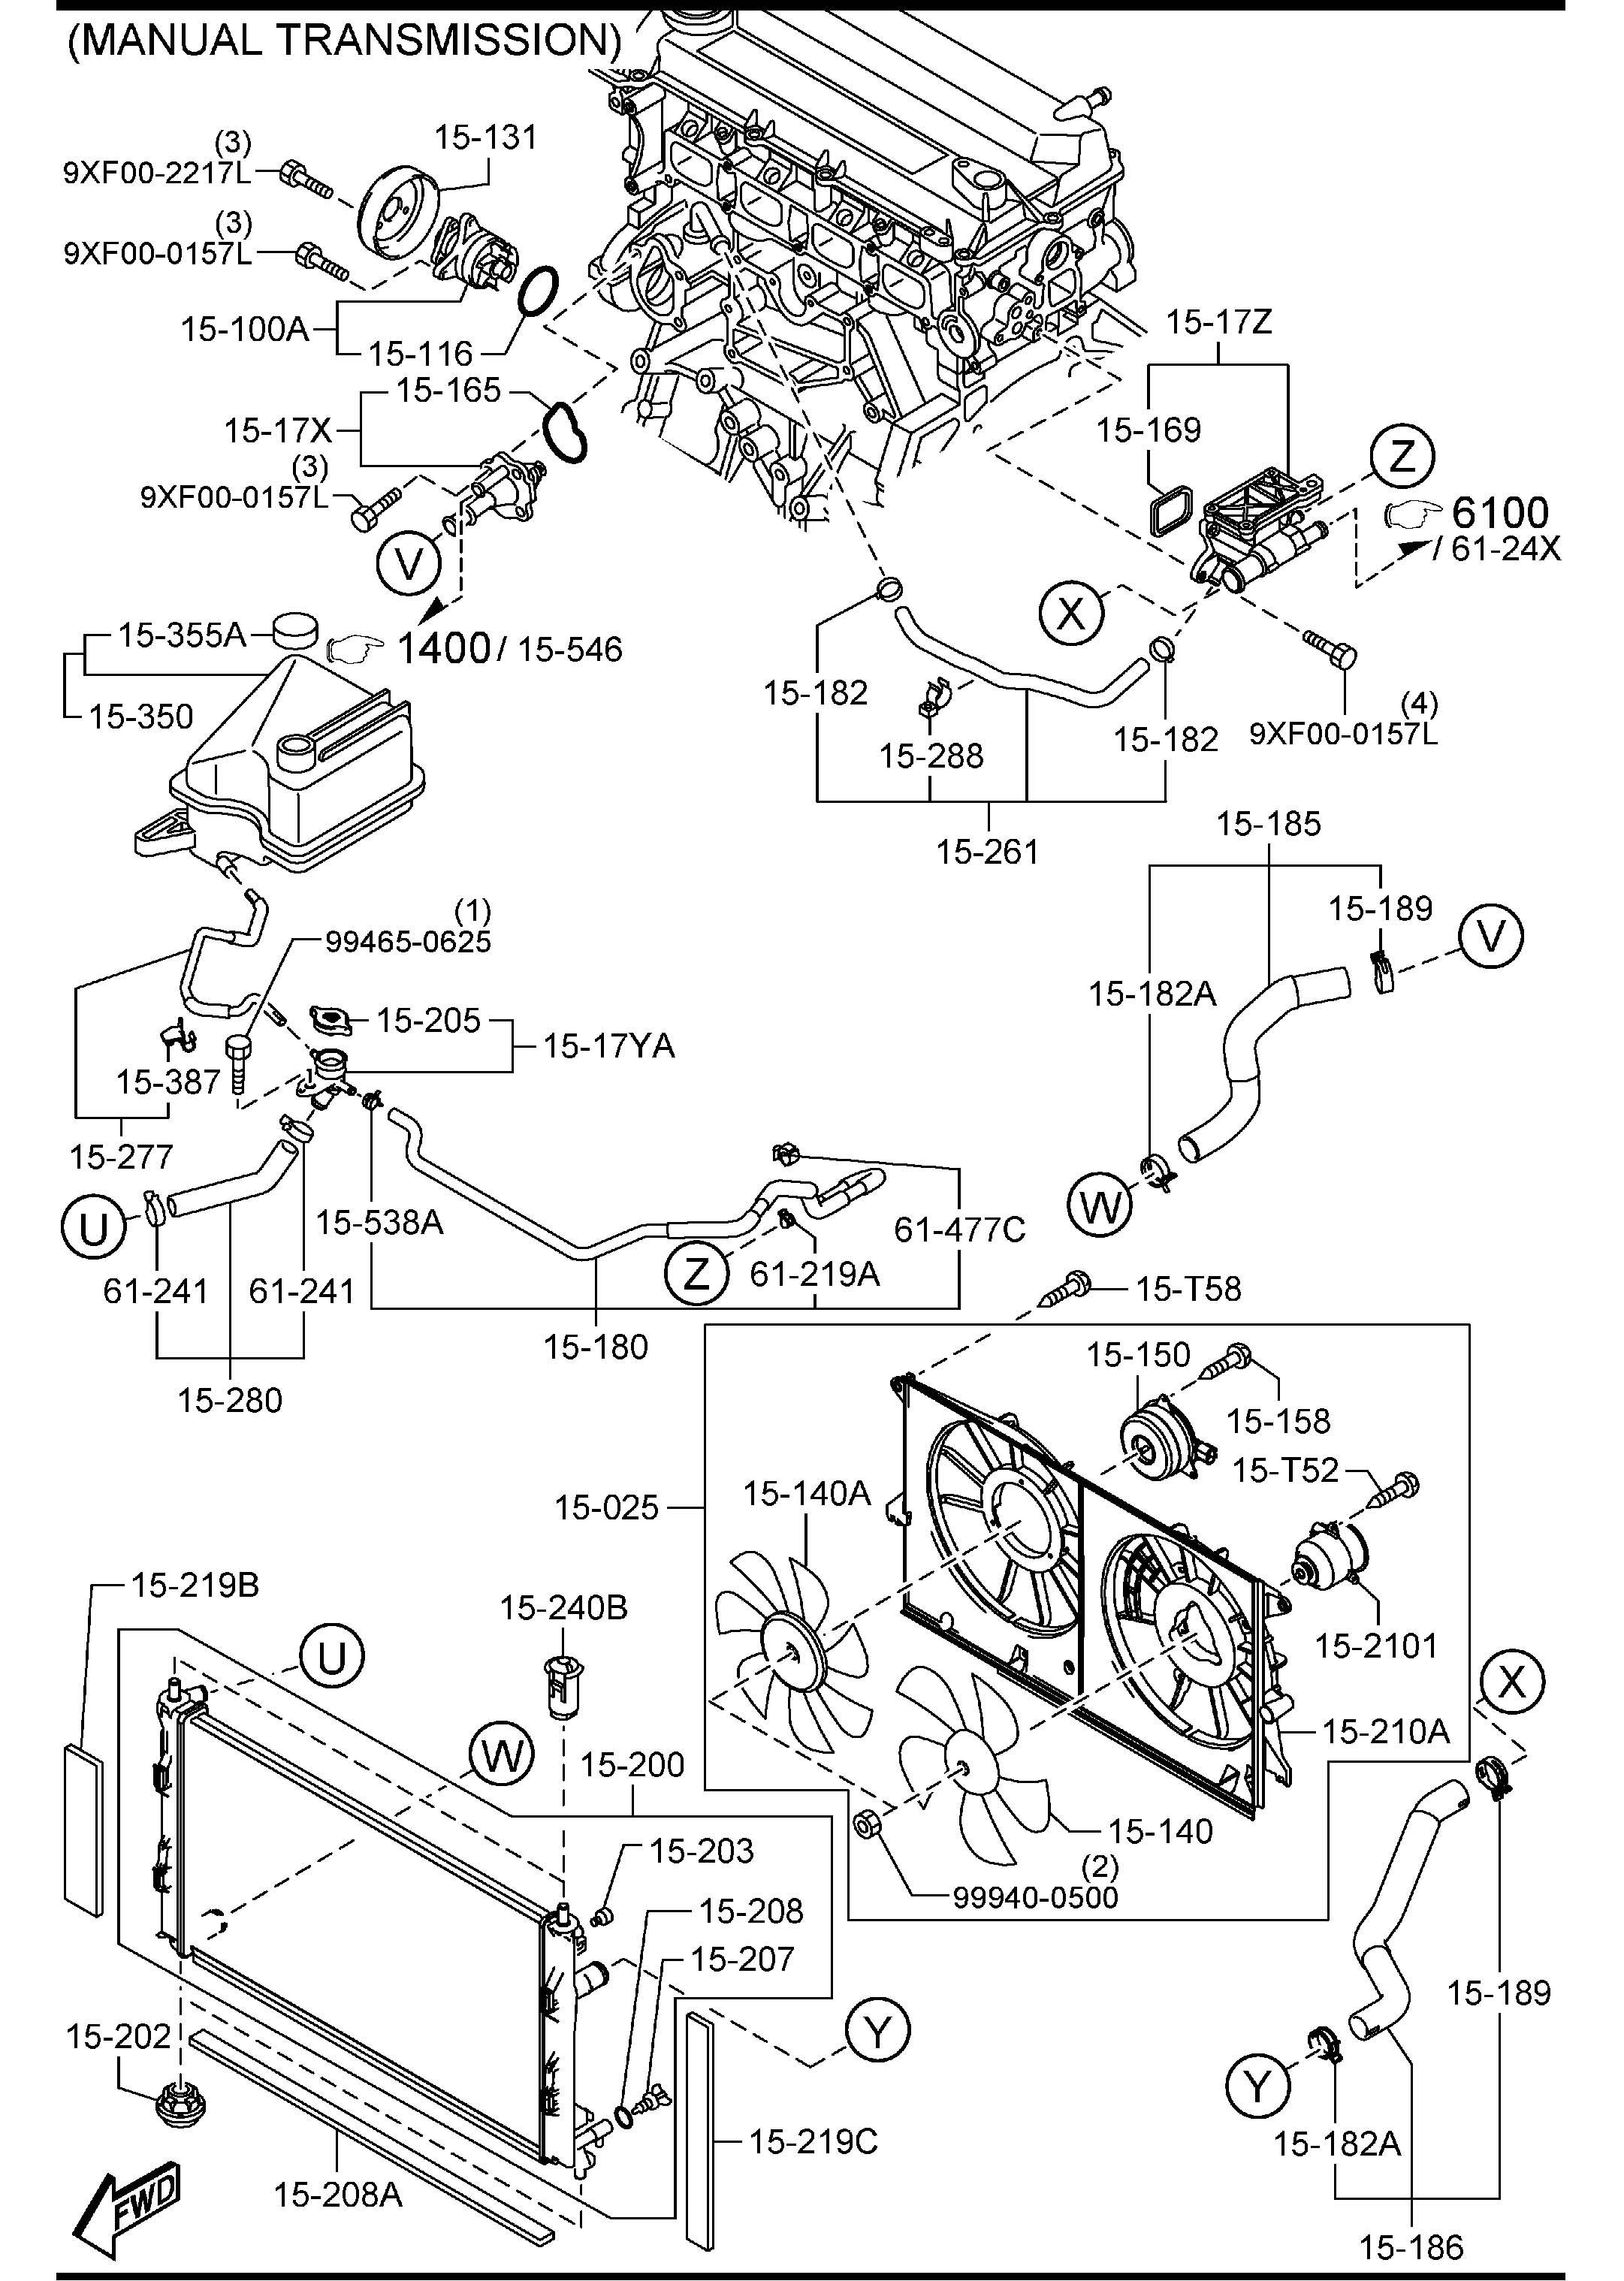 COOLING SYSTEM (MANUAL TRANSMISSION). 1500A for Mazda 5. #363636